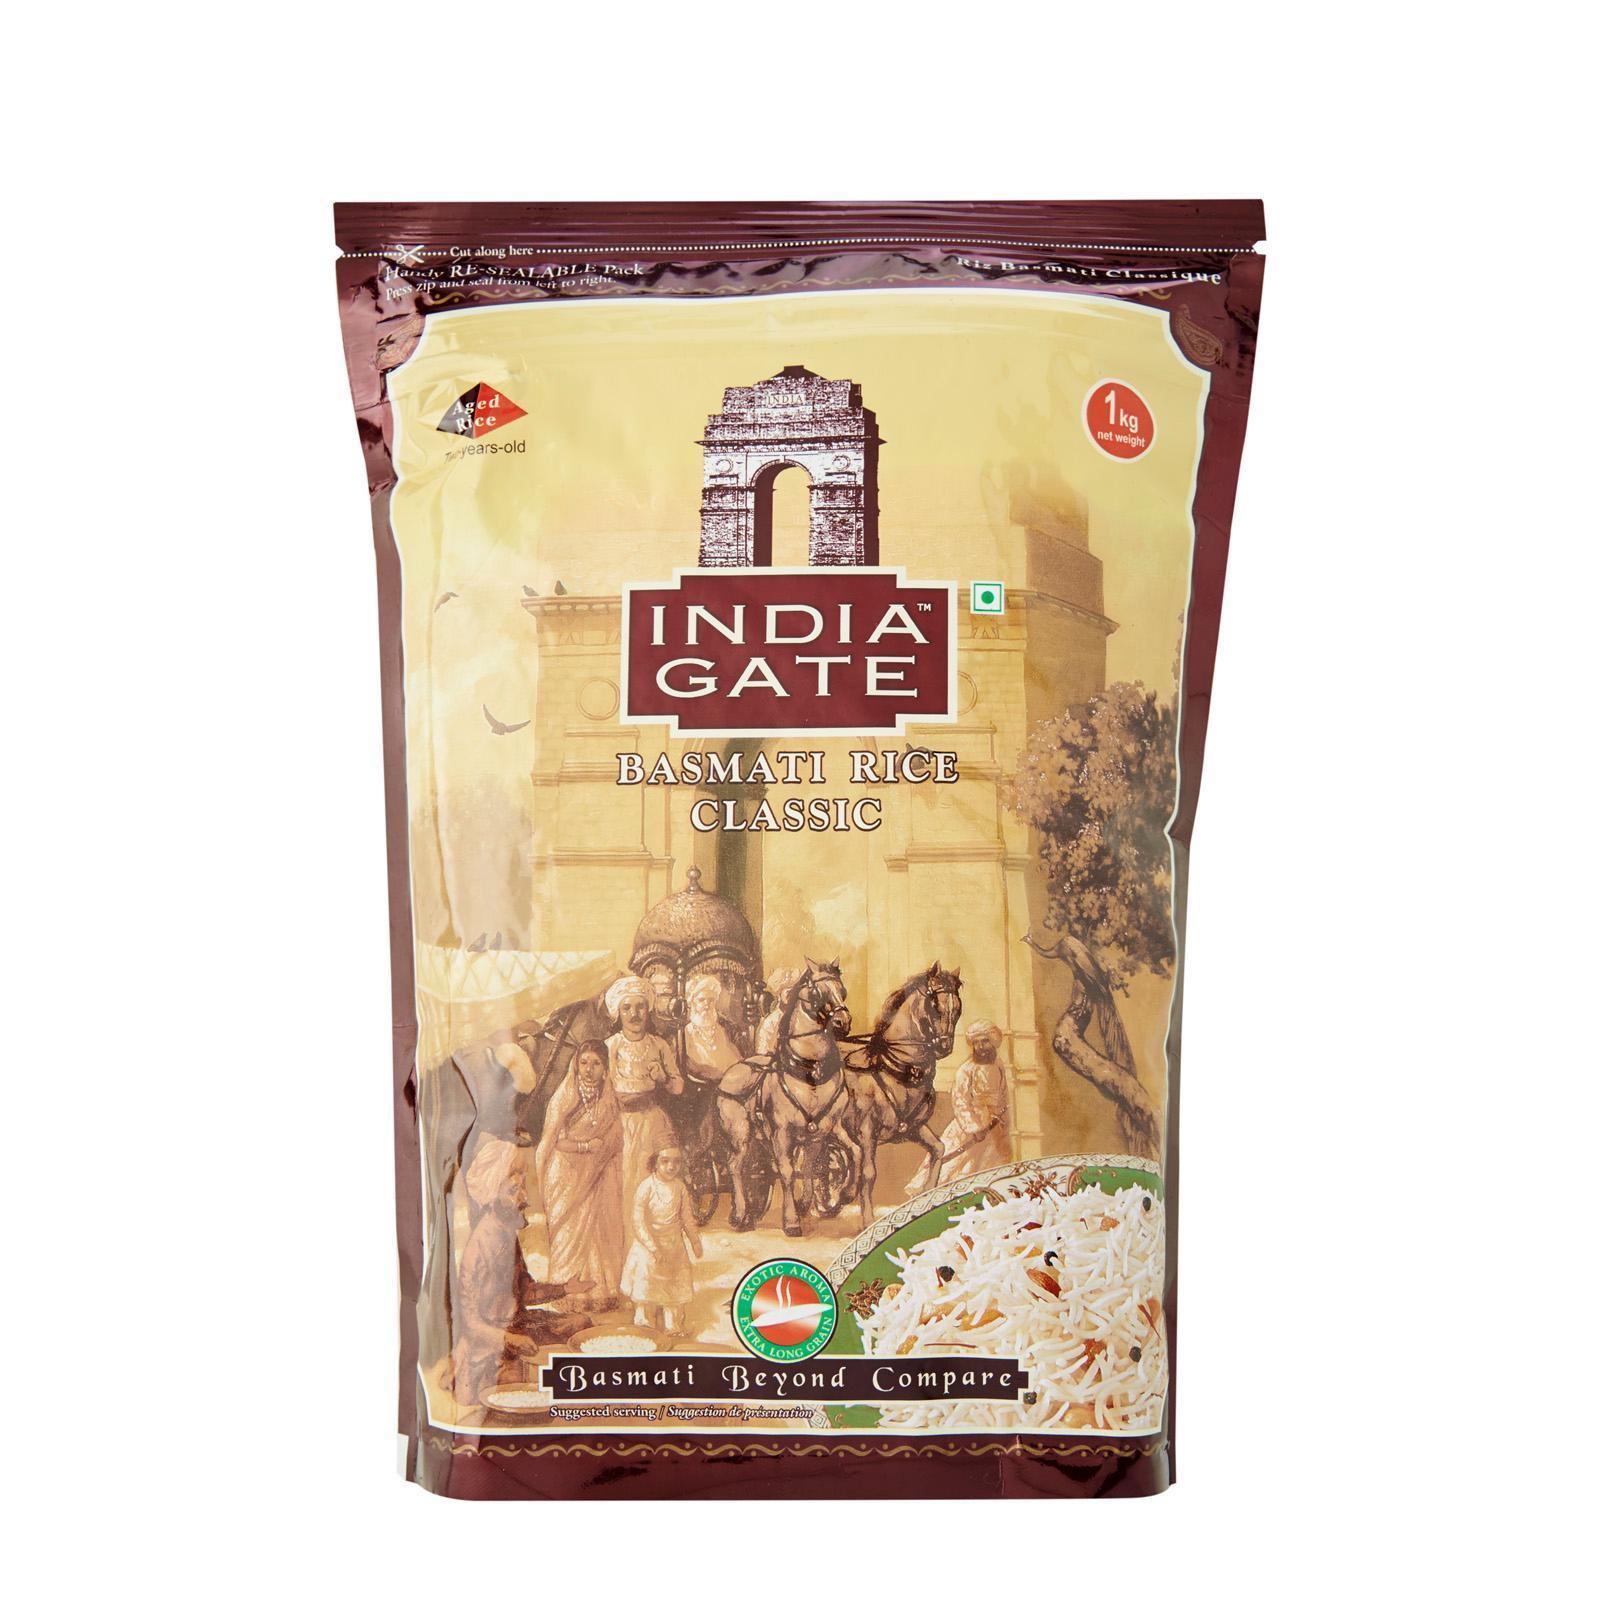 Indiagate Classic Basmati Rice By Ramon.